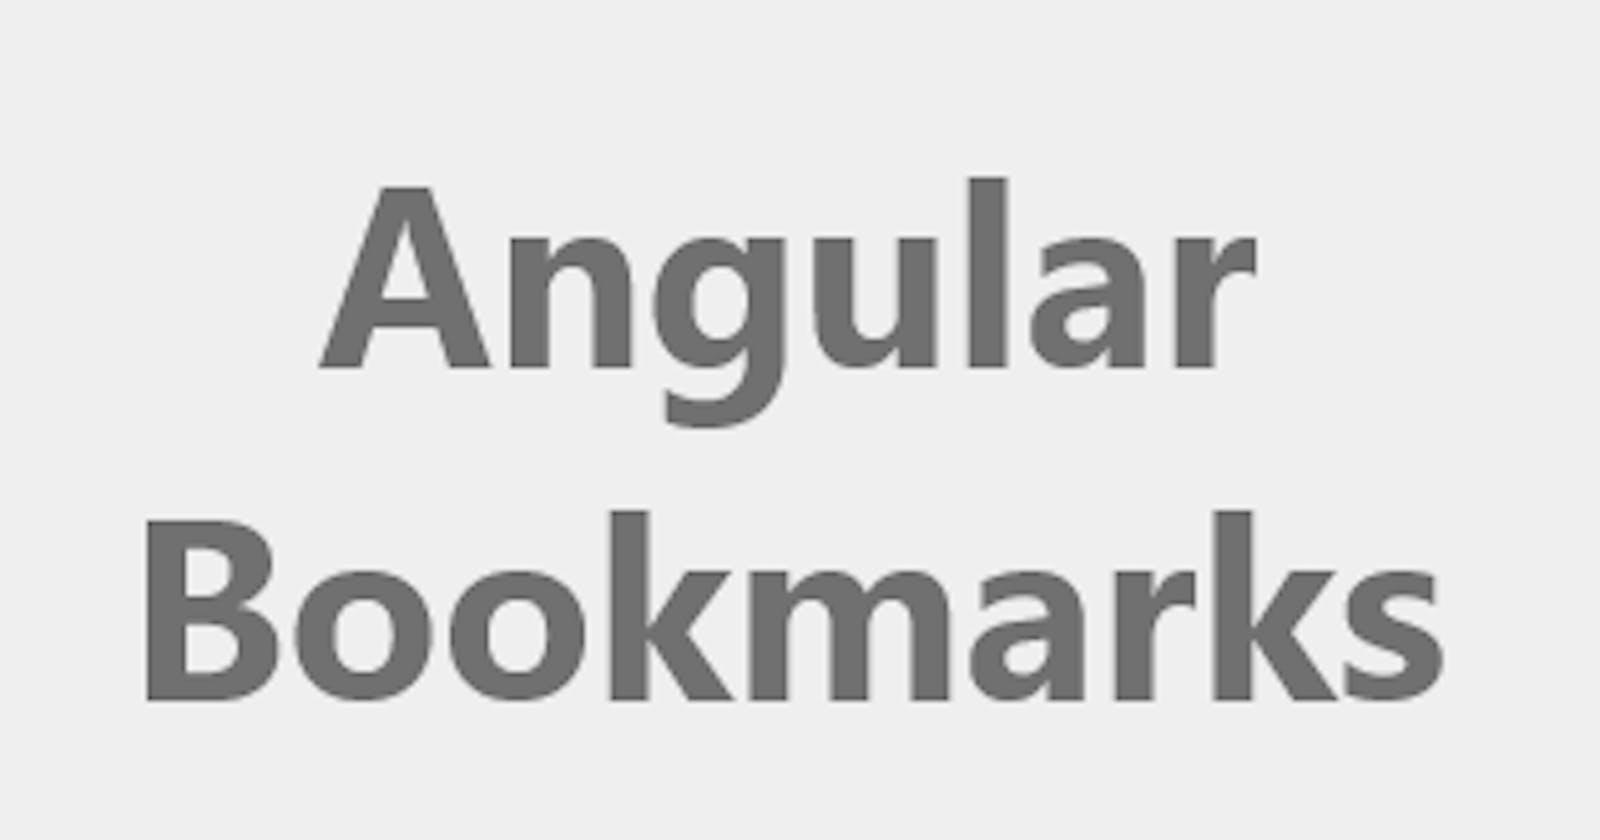 Angular training bookmarks